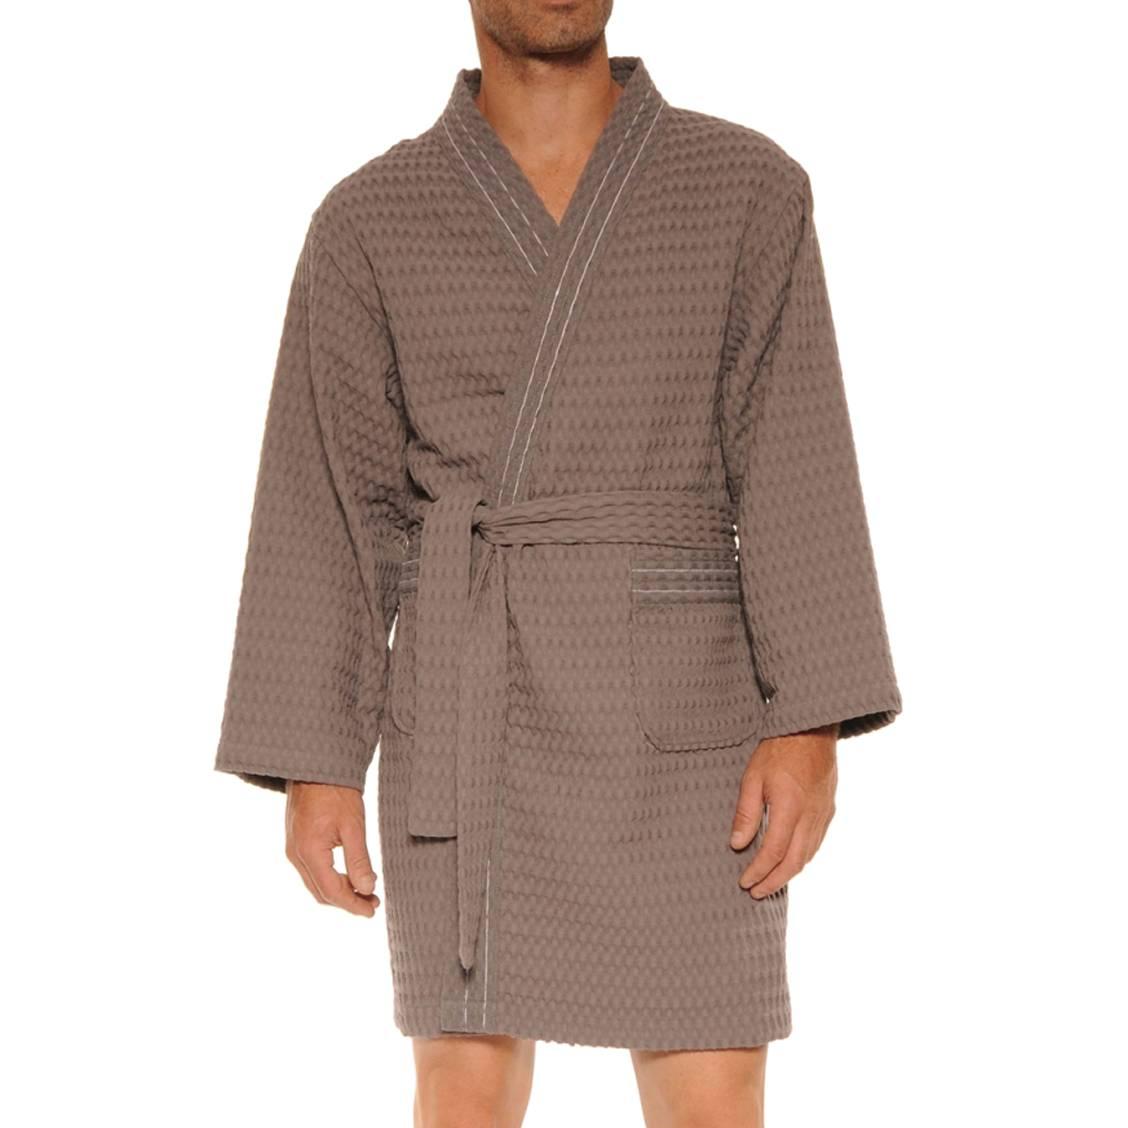 Kimono Christian Cane Oskar en coton gris à tissage matelassé